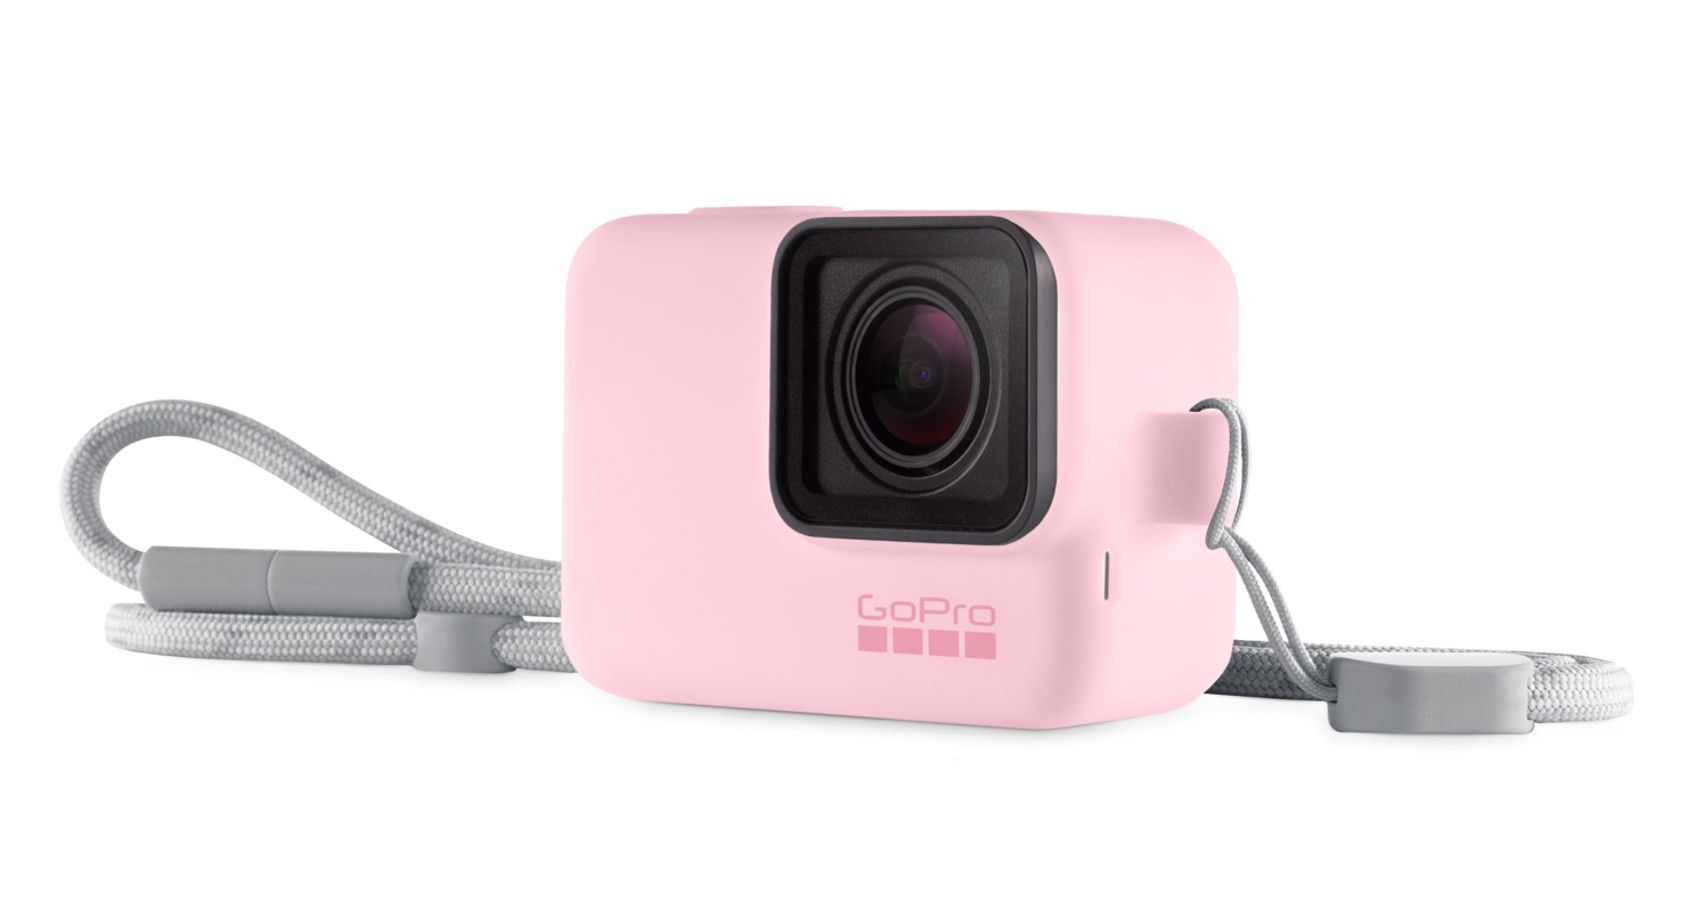 Capa de Silicone + Cordão GoPro Sleeve Rosa ACSST-004 Hero 5/6/7